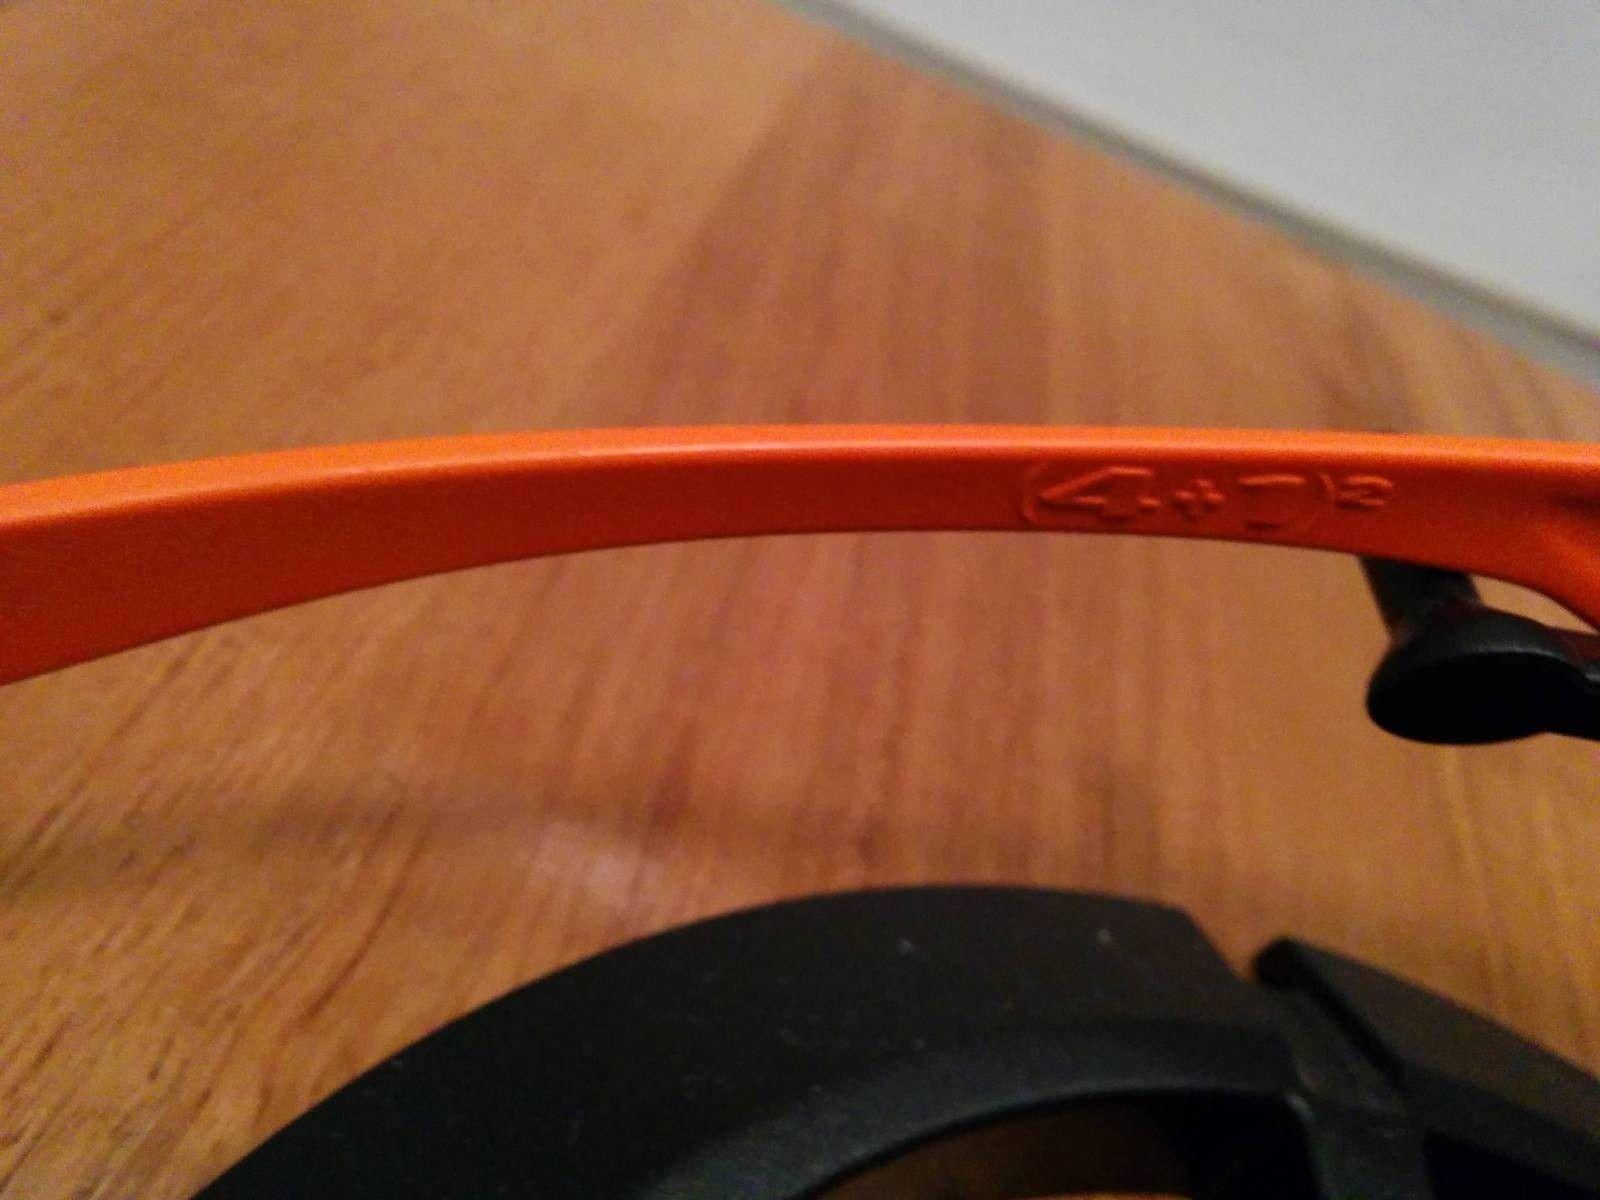 Safety Orange Cerakote Fives Squared/Grey Lens - fQOVsuQ.jpg